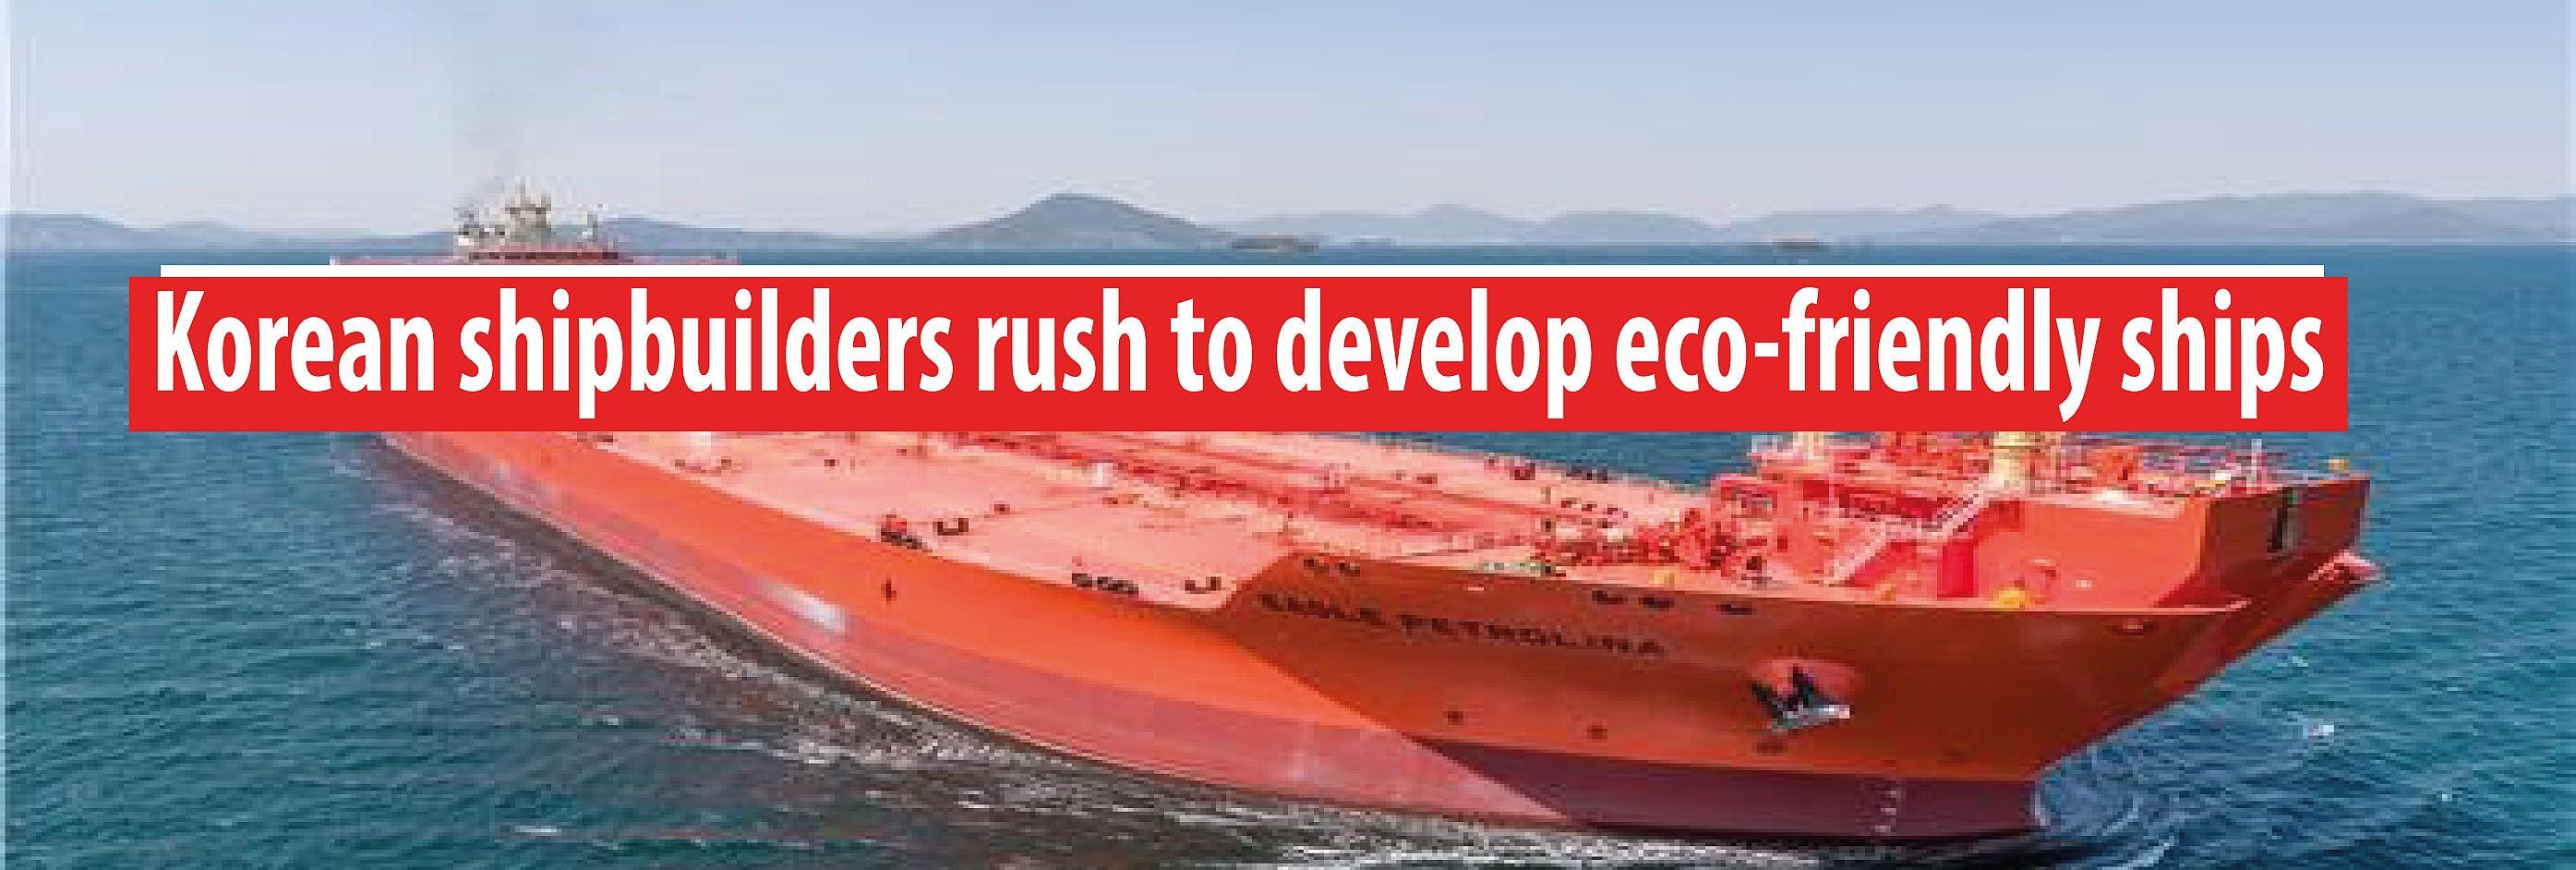 Korean shipbuilders rush to develop eco-friendly ships amid regulations!